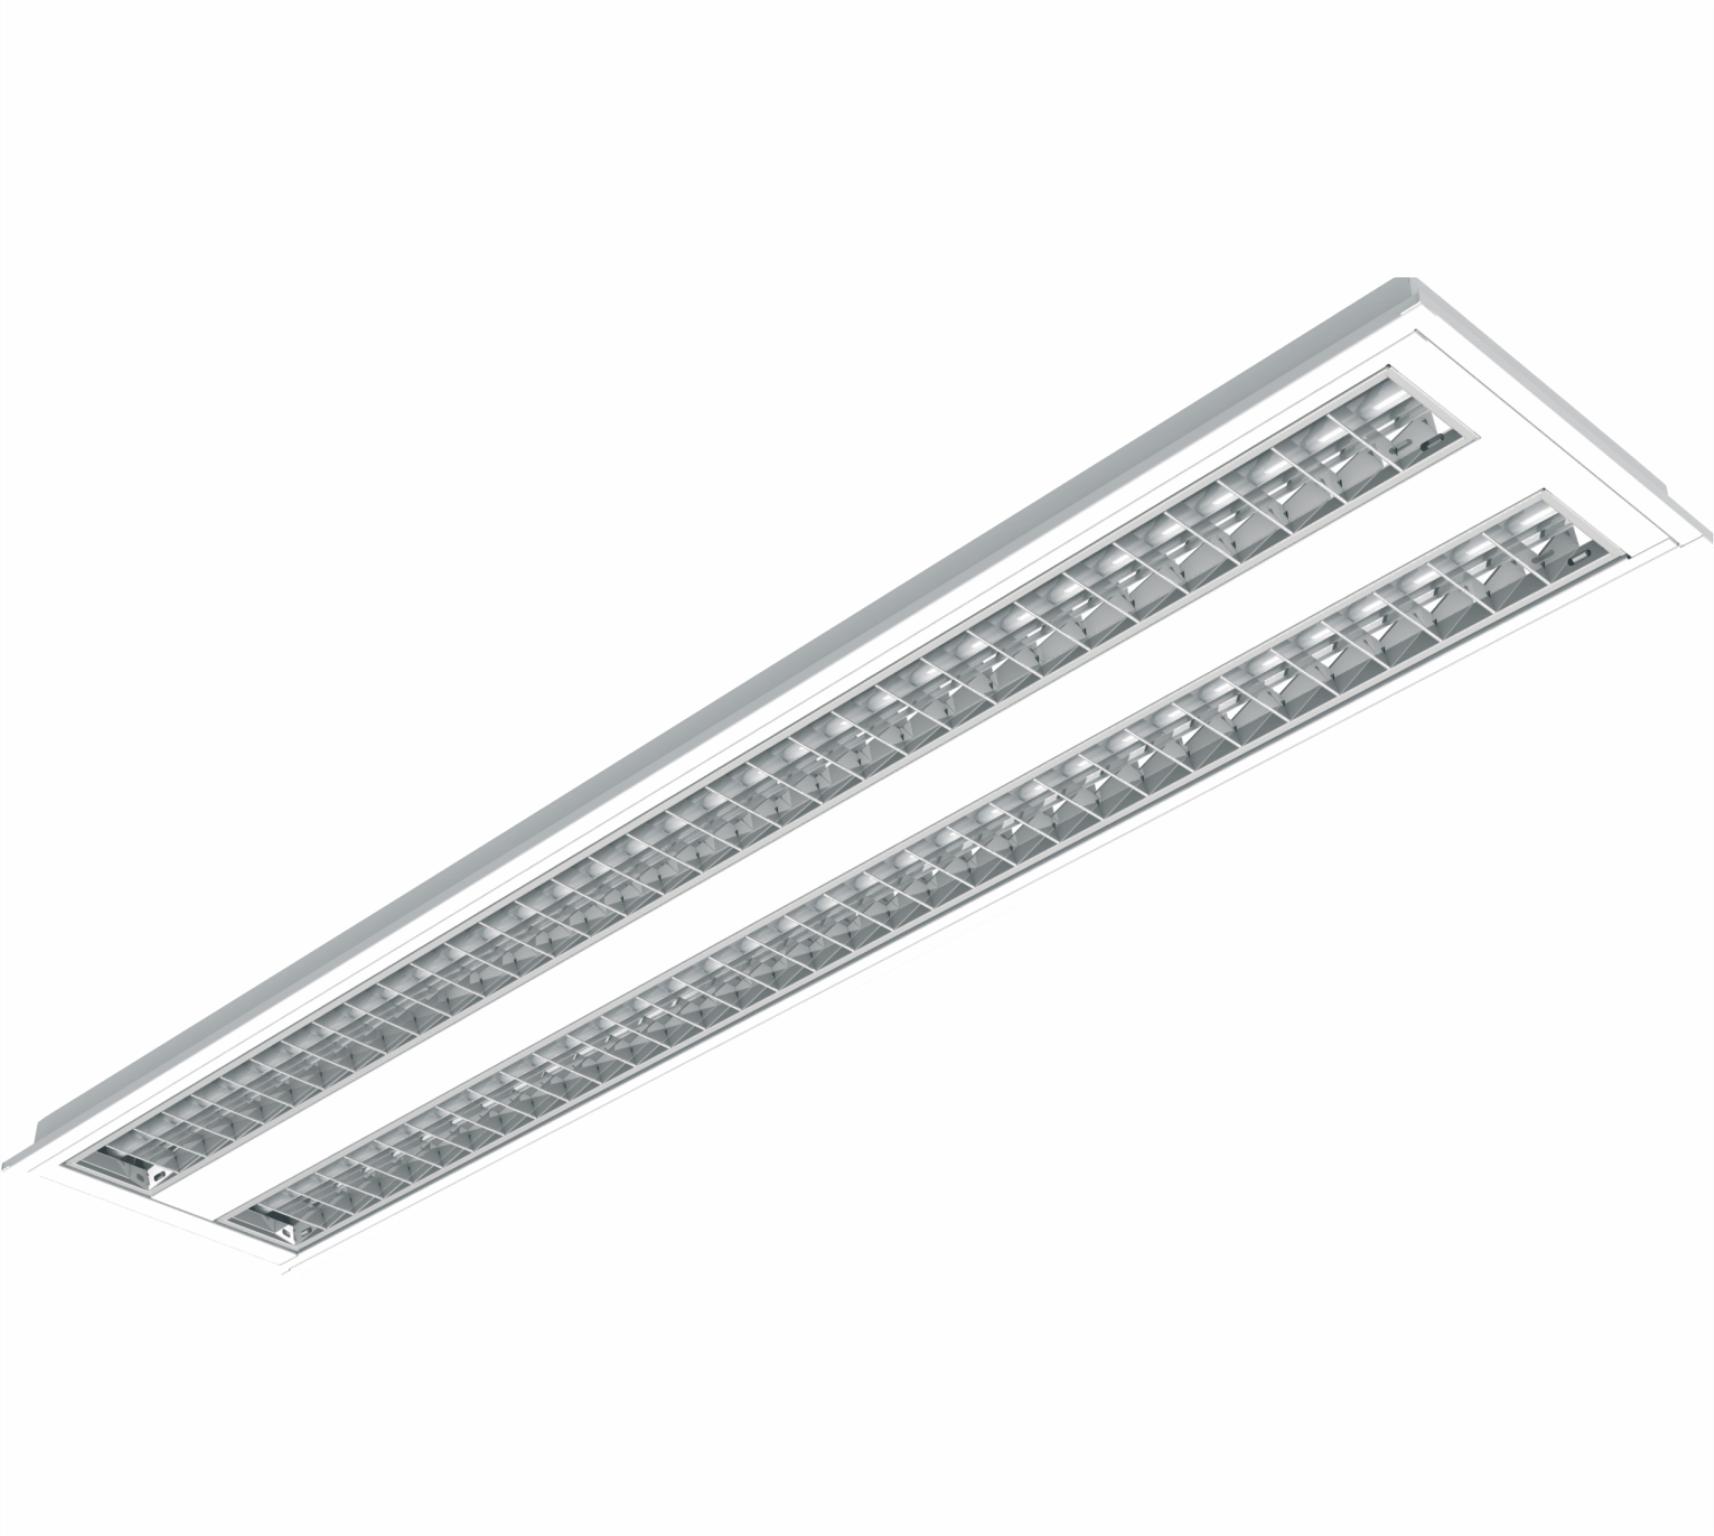 Luminaria De Alto Rendimento T5 2x28 54w De Embutir